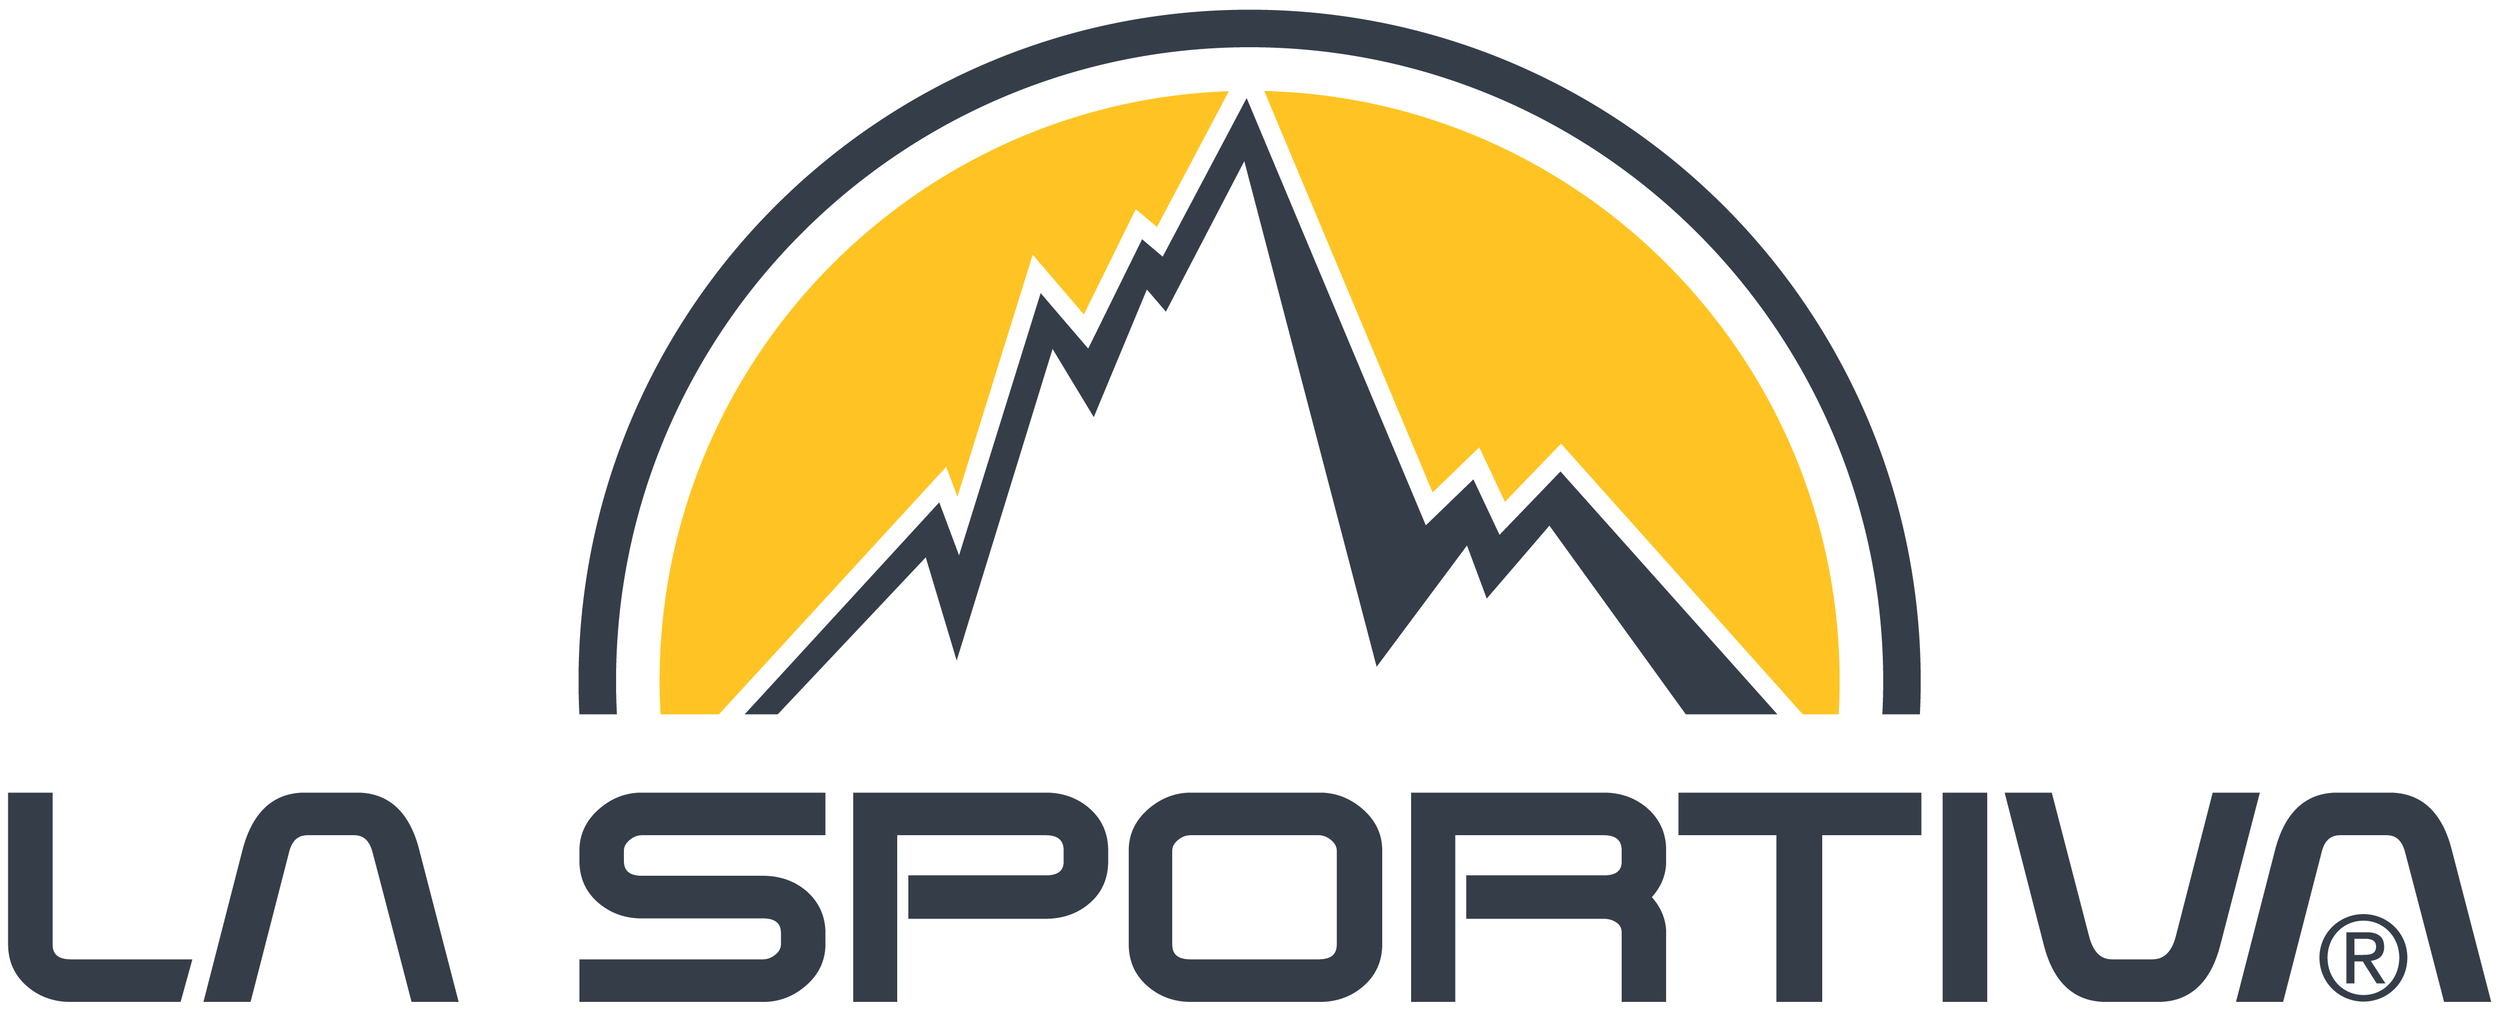 LaSportiva_Logo_1.jpg